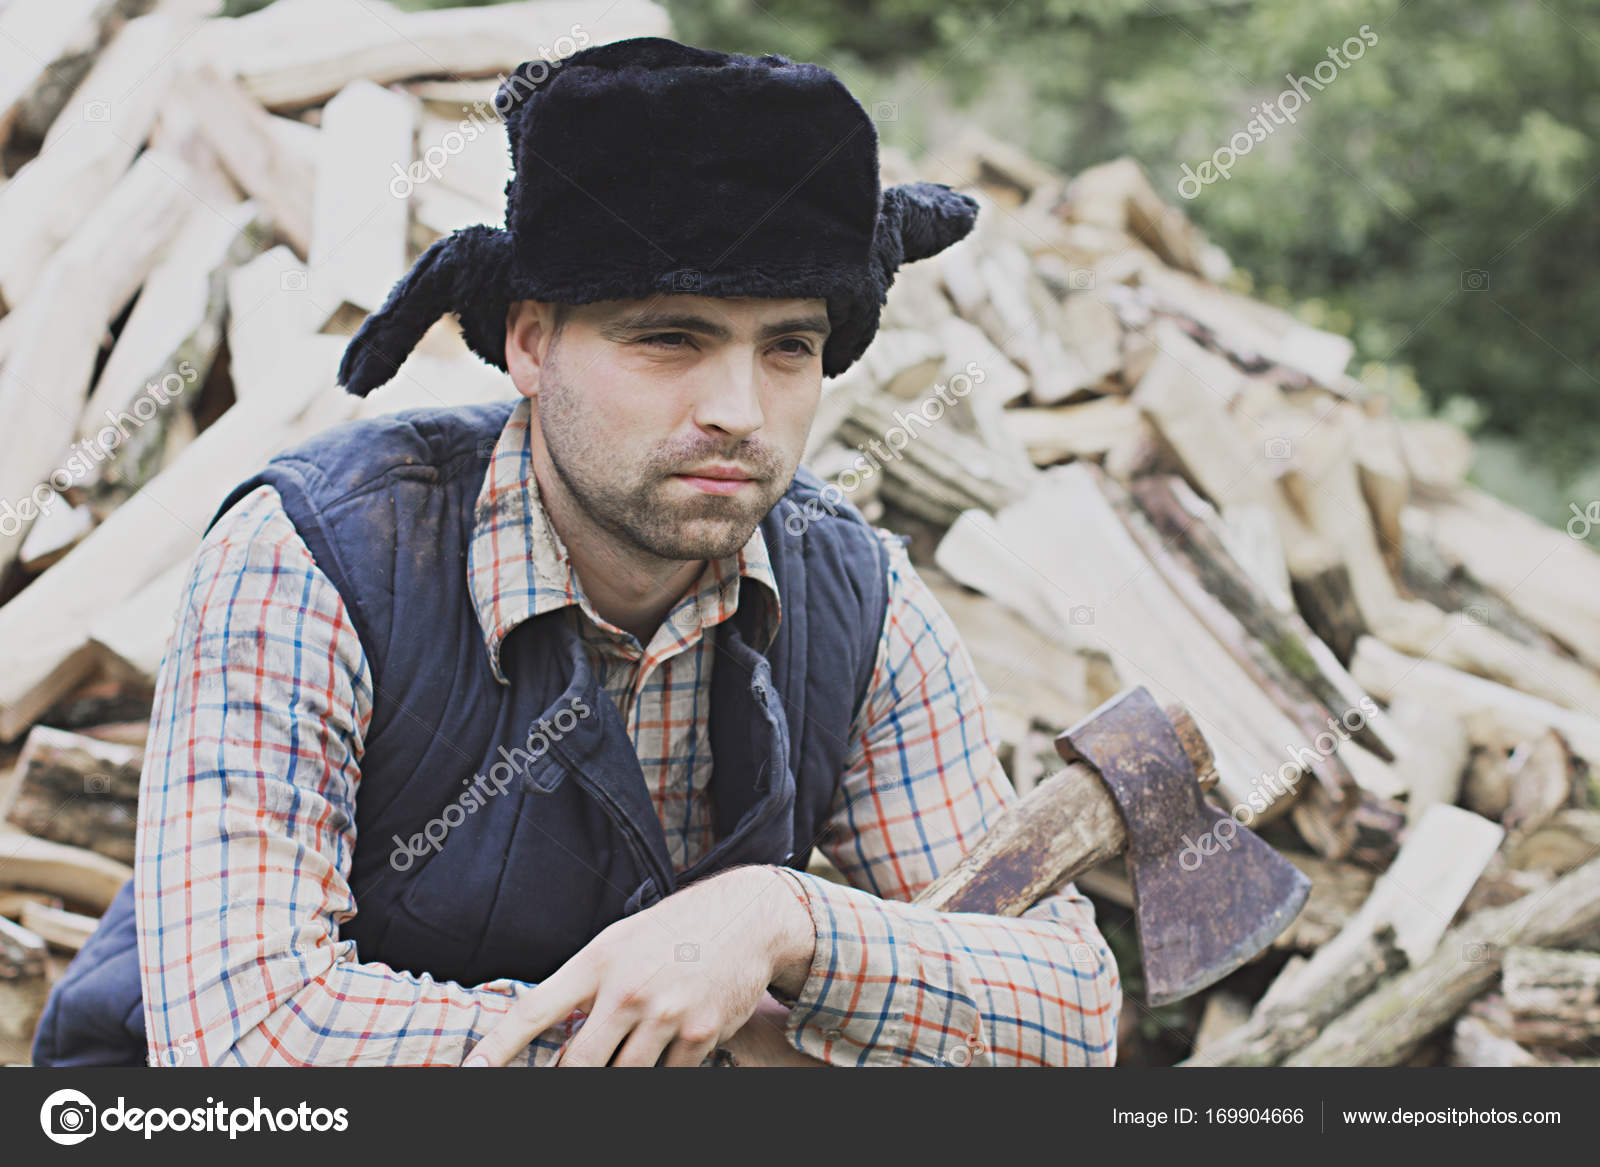 leñador en el sombrero — Fotos de Stock © solstudio  169904666 64d319b6664